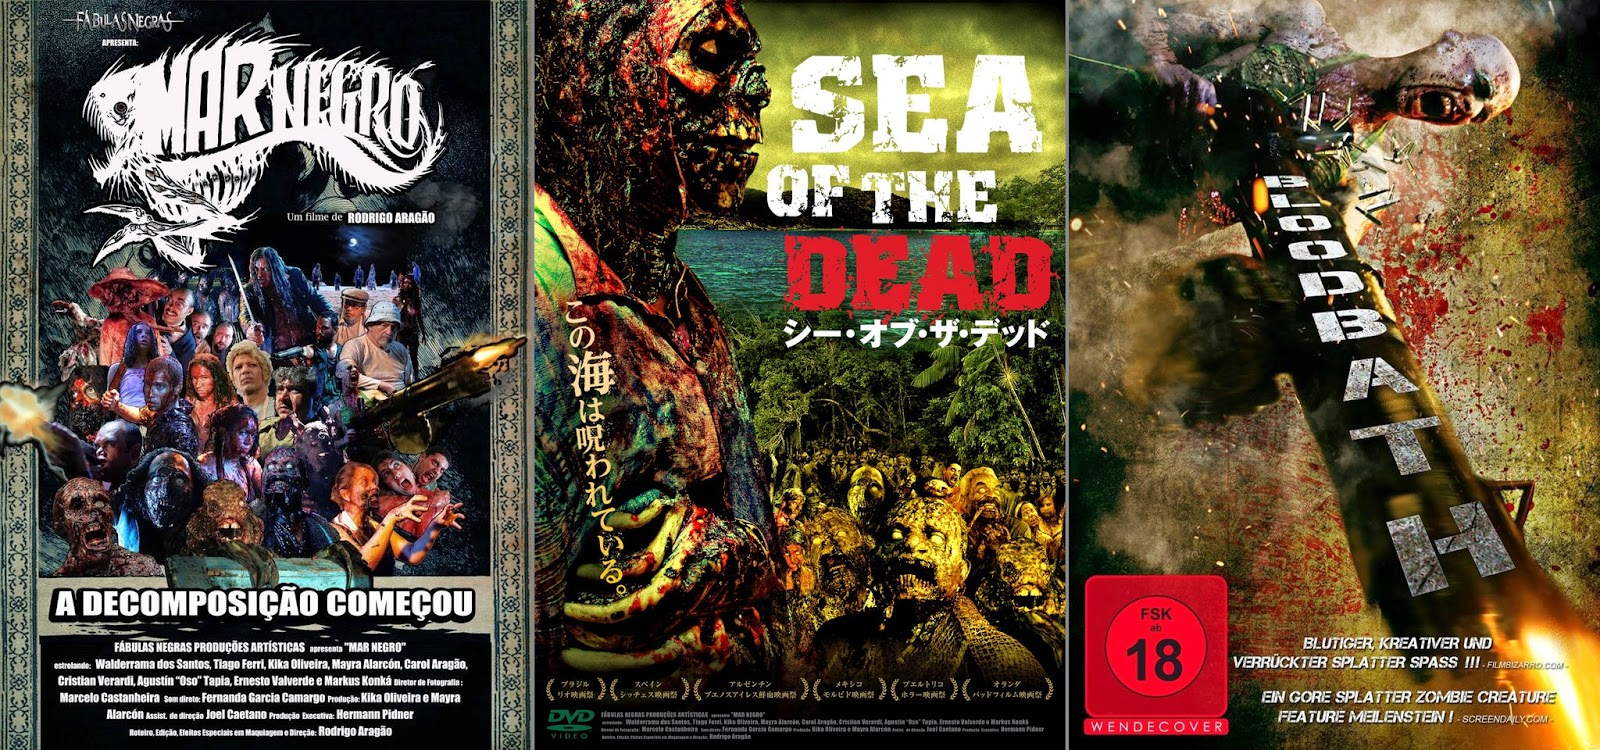 Mar Negro, da sinistra: poster brasiliano, giapponese tedesco